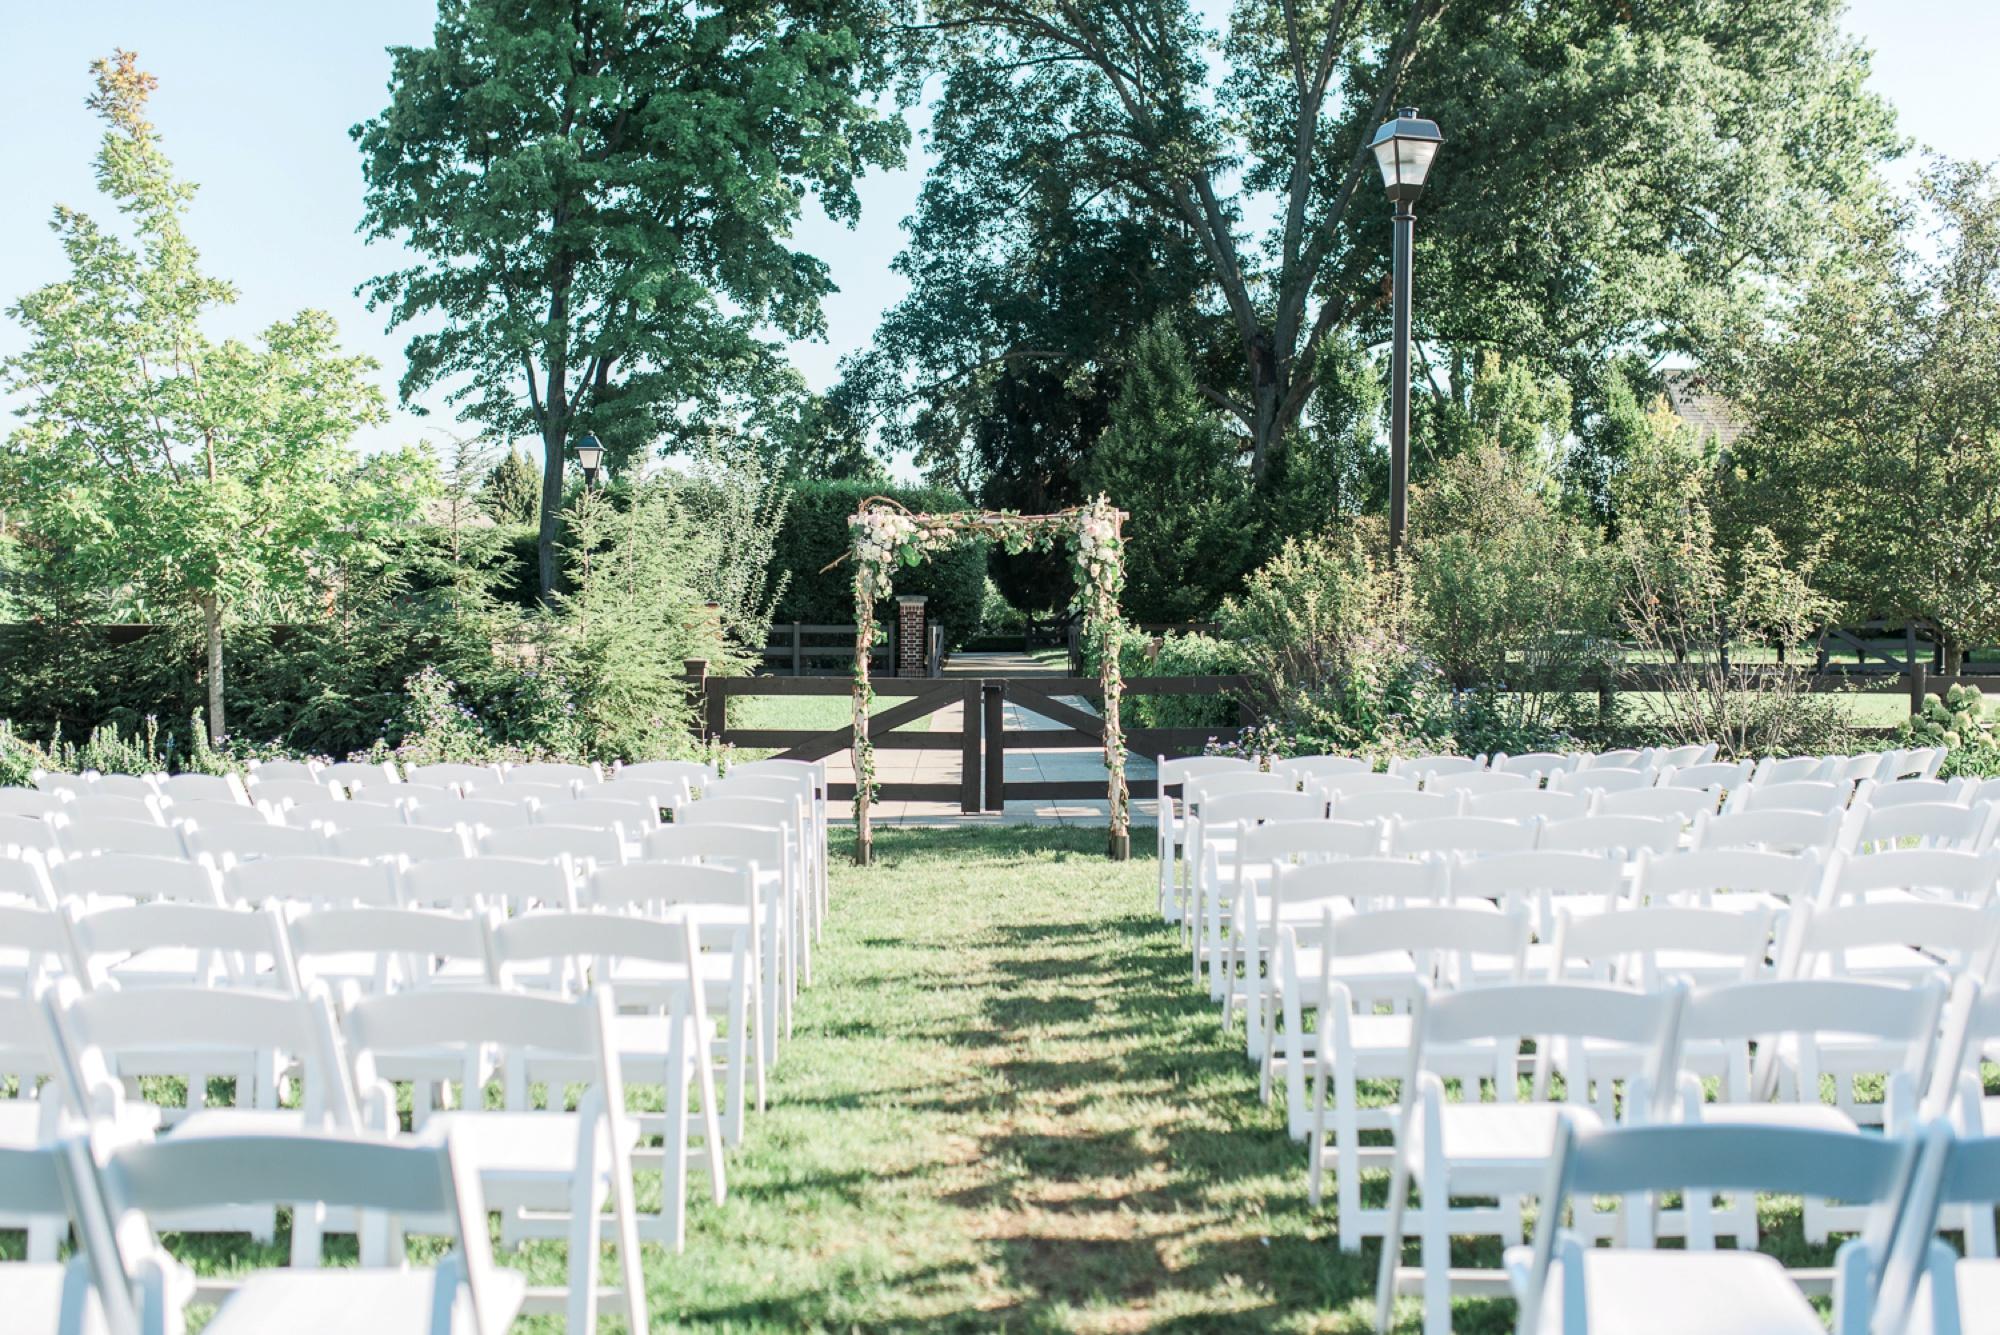 wells-barn-wedding-at-franklin-park-conservatory-40.jpg